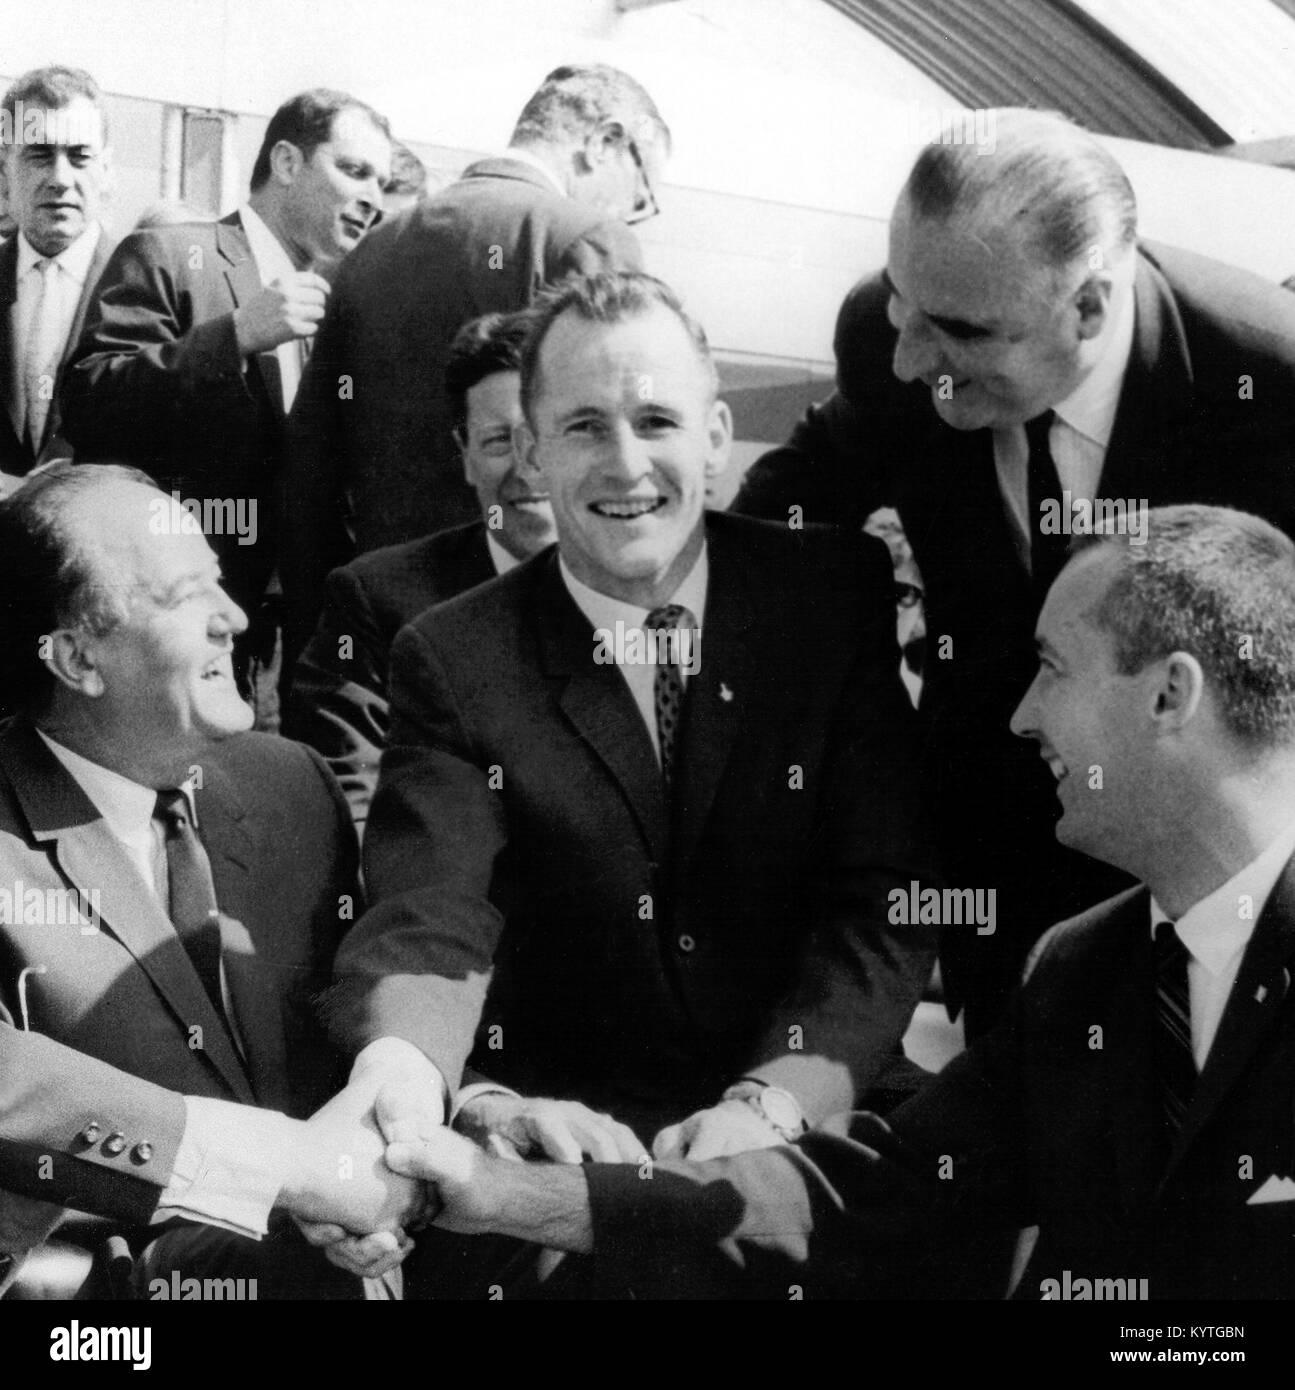 The Russian cosmonaut Yuri Gagarin (1934-1968) meeting astronauts from NASA's Gemini 4 program at the Paris - Stock Image